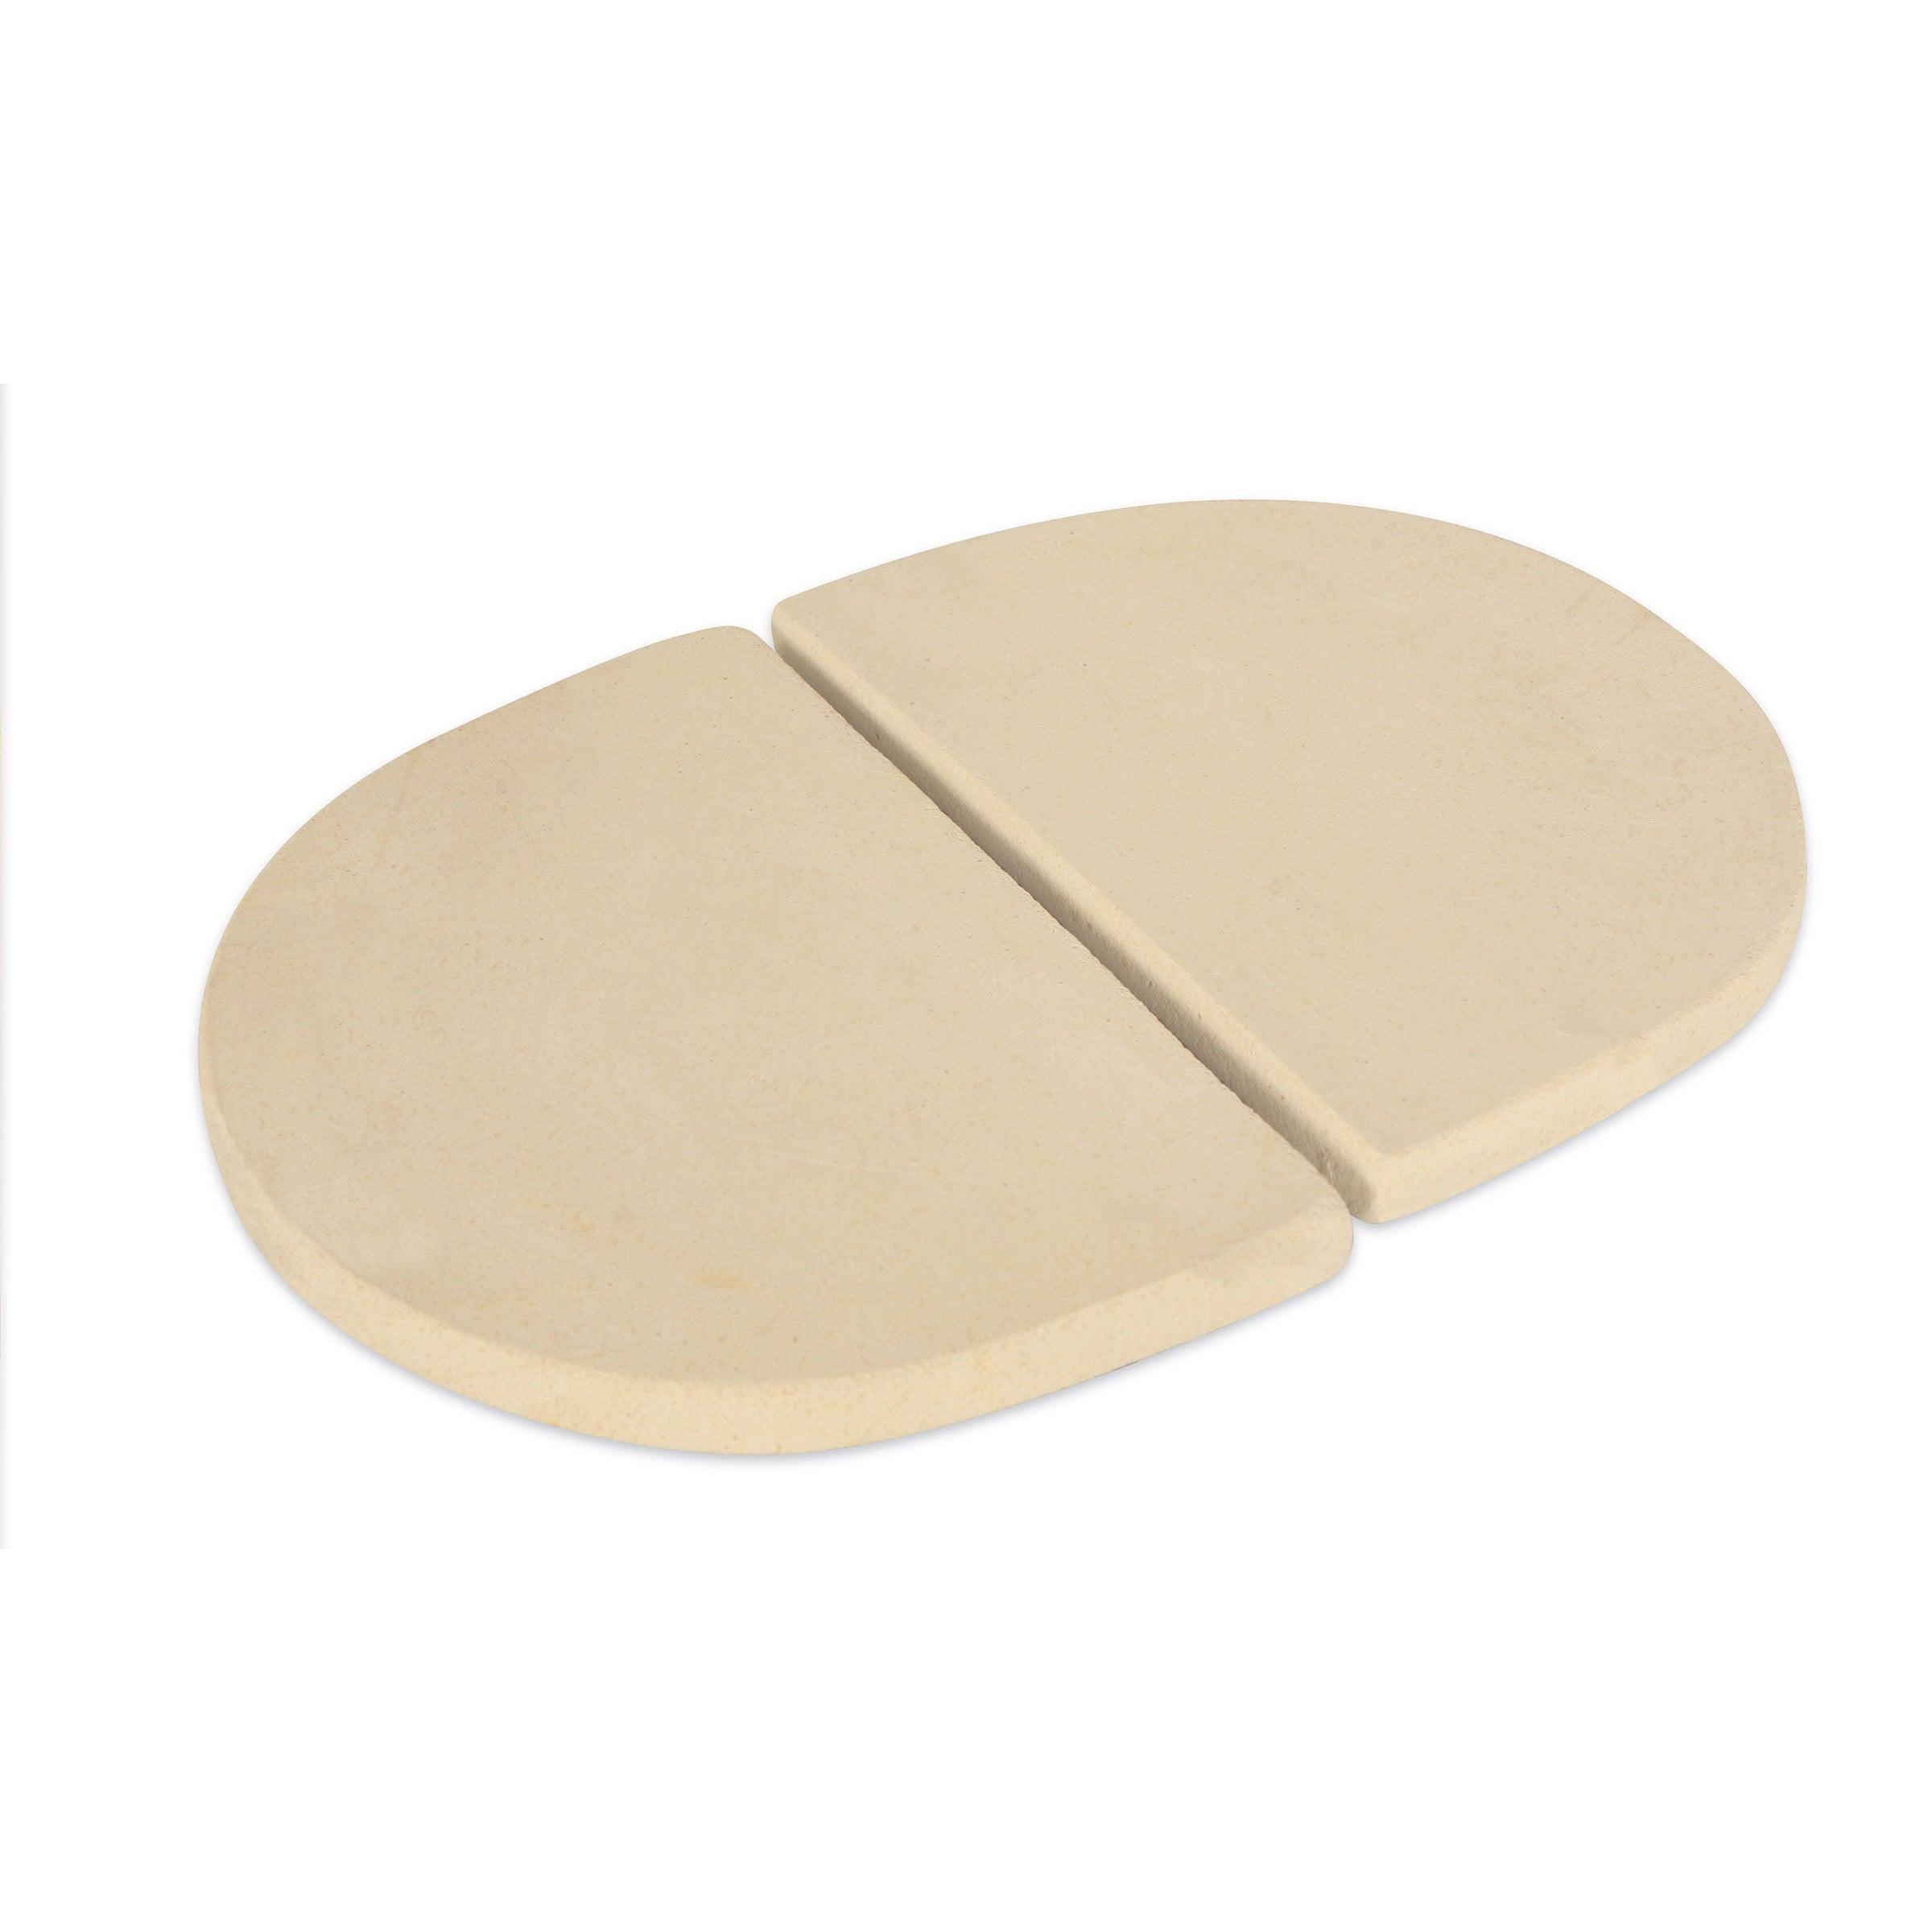 Overstock.com Primo Ceramic Heat Deflector Plates for Oval 400 at Sears.com